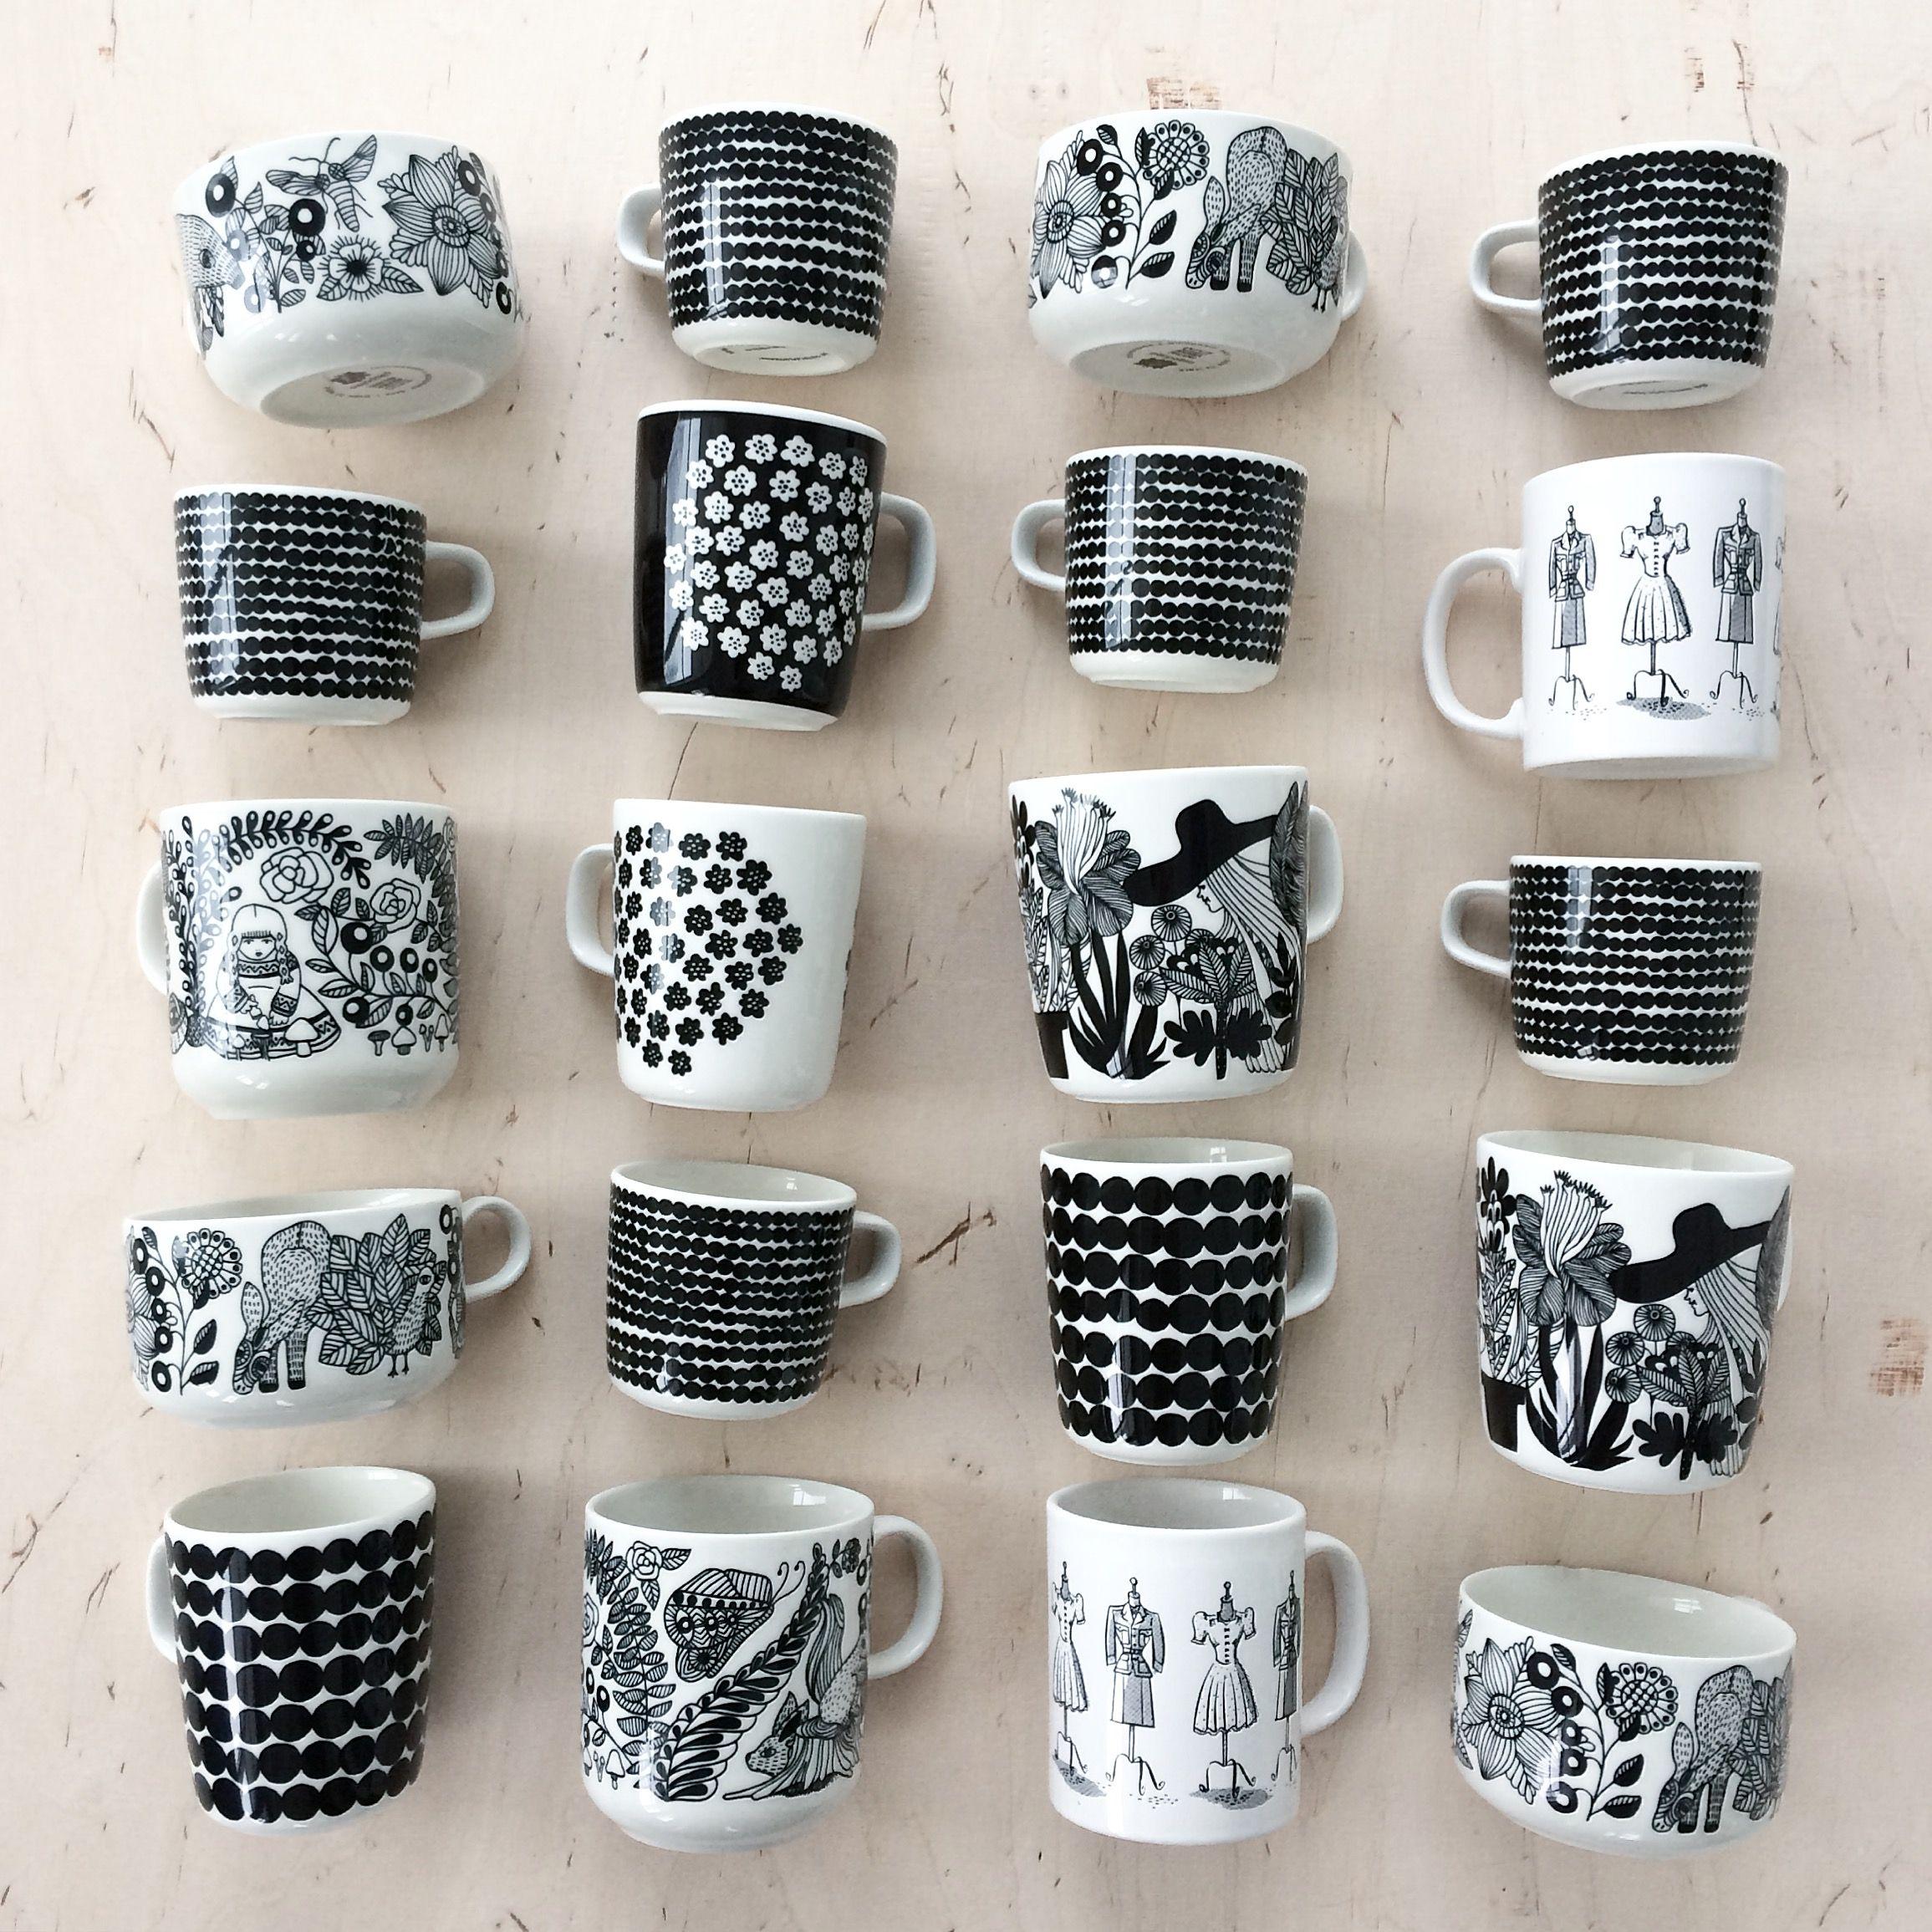 Obsessed Black And White Coffee Cups Marimekko Arabia Finland Interiors Nordic Living By Johanna Sandberg Scandi Design Marimekko Scandinavian Design